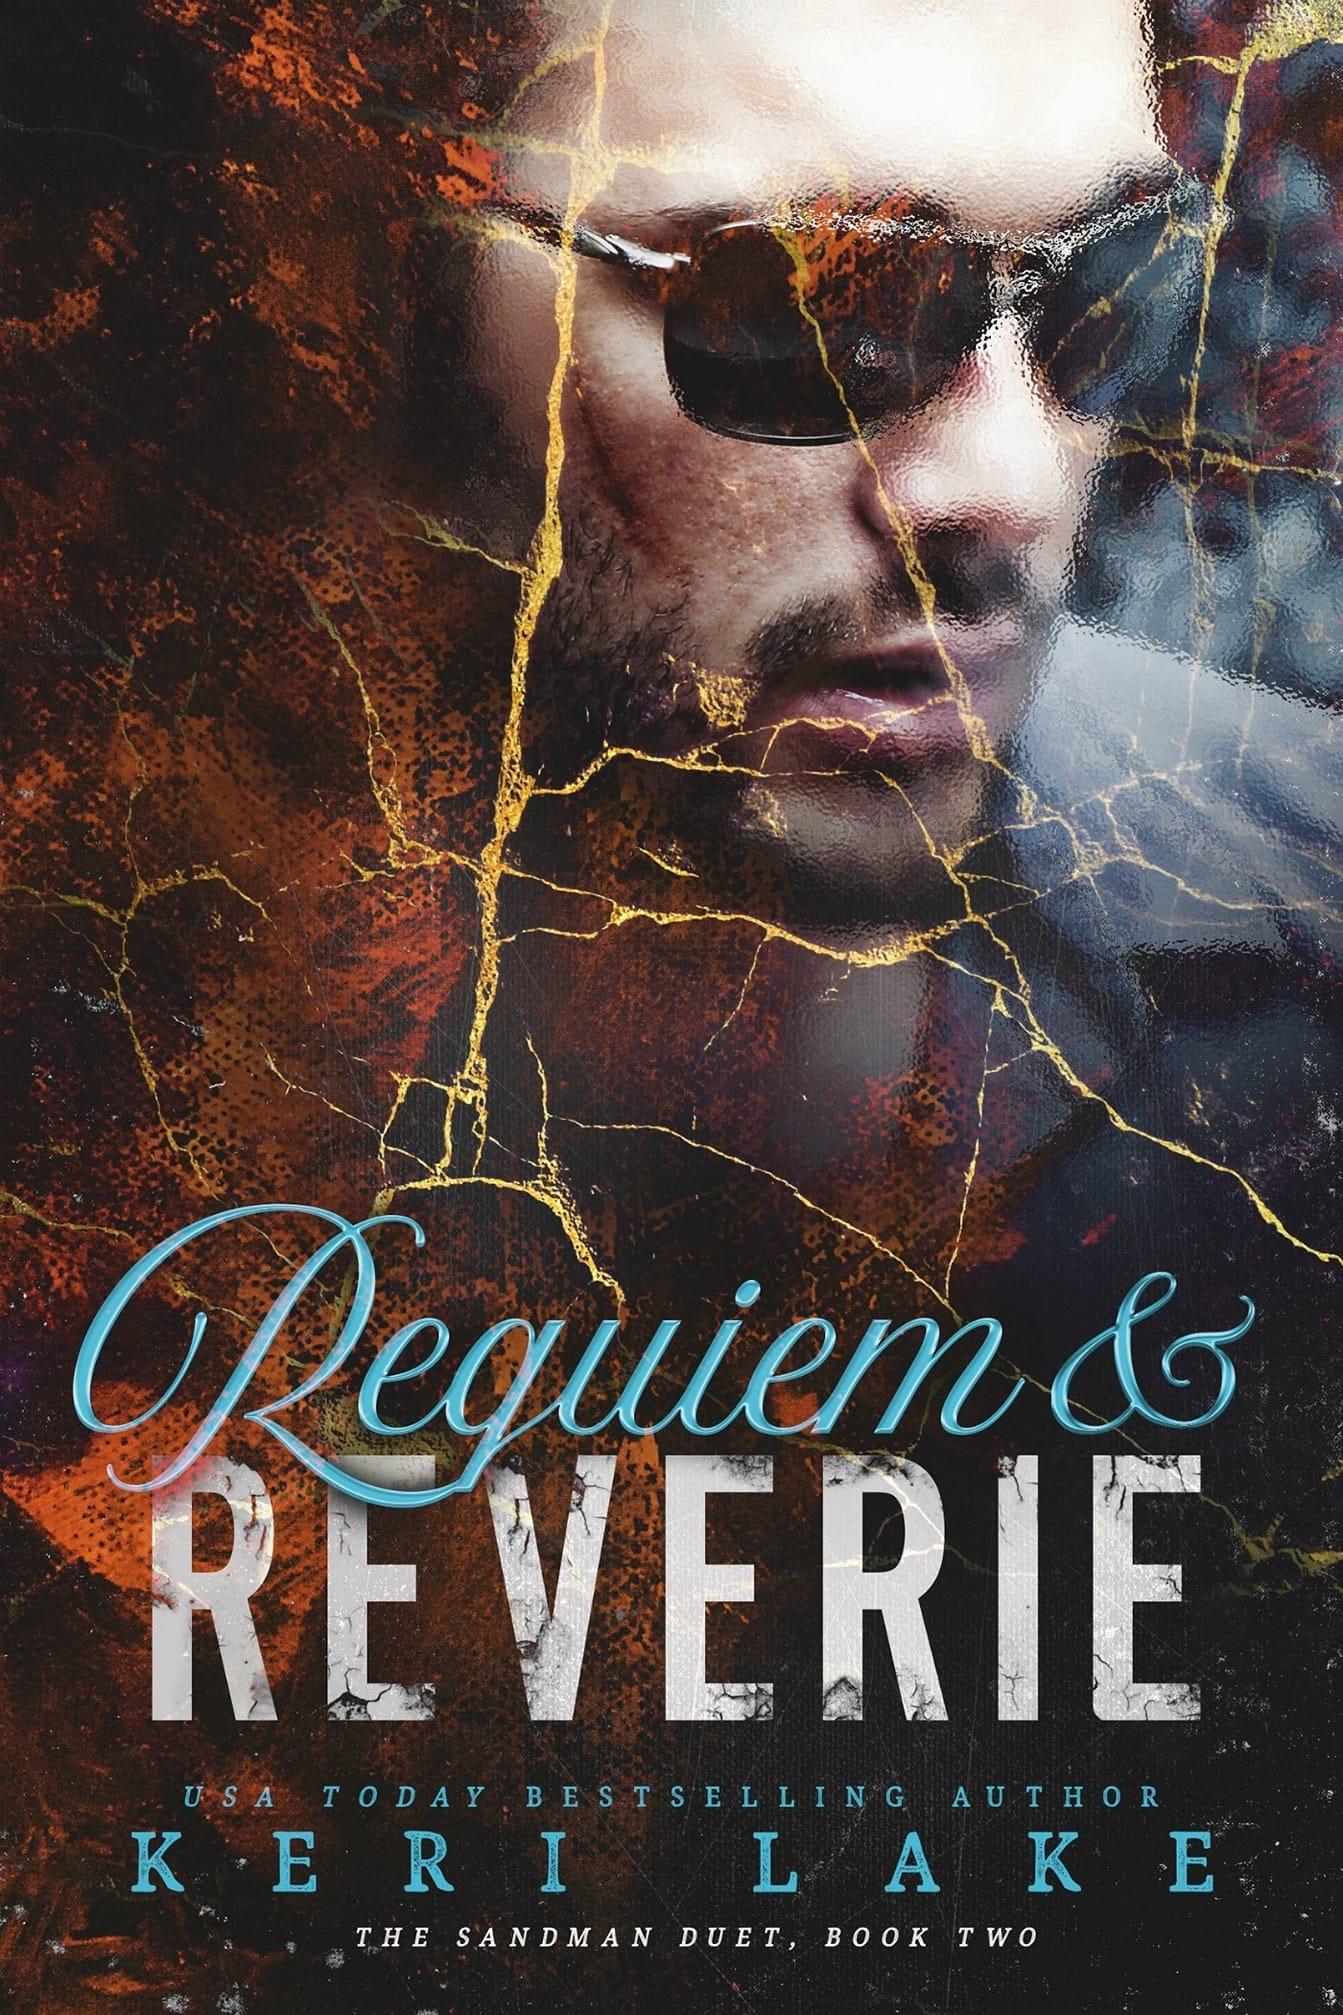 Keri Lake - The Sandman Duet 2 - Requiem & Reverie